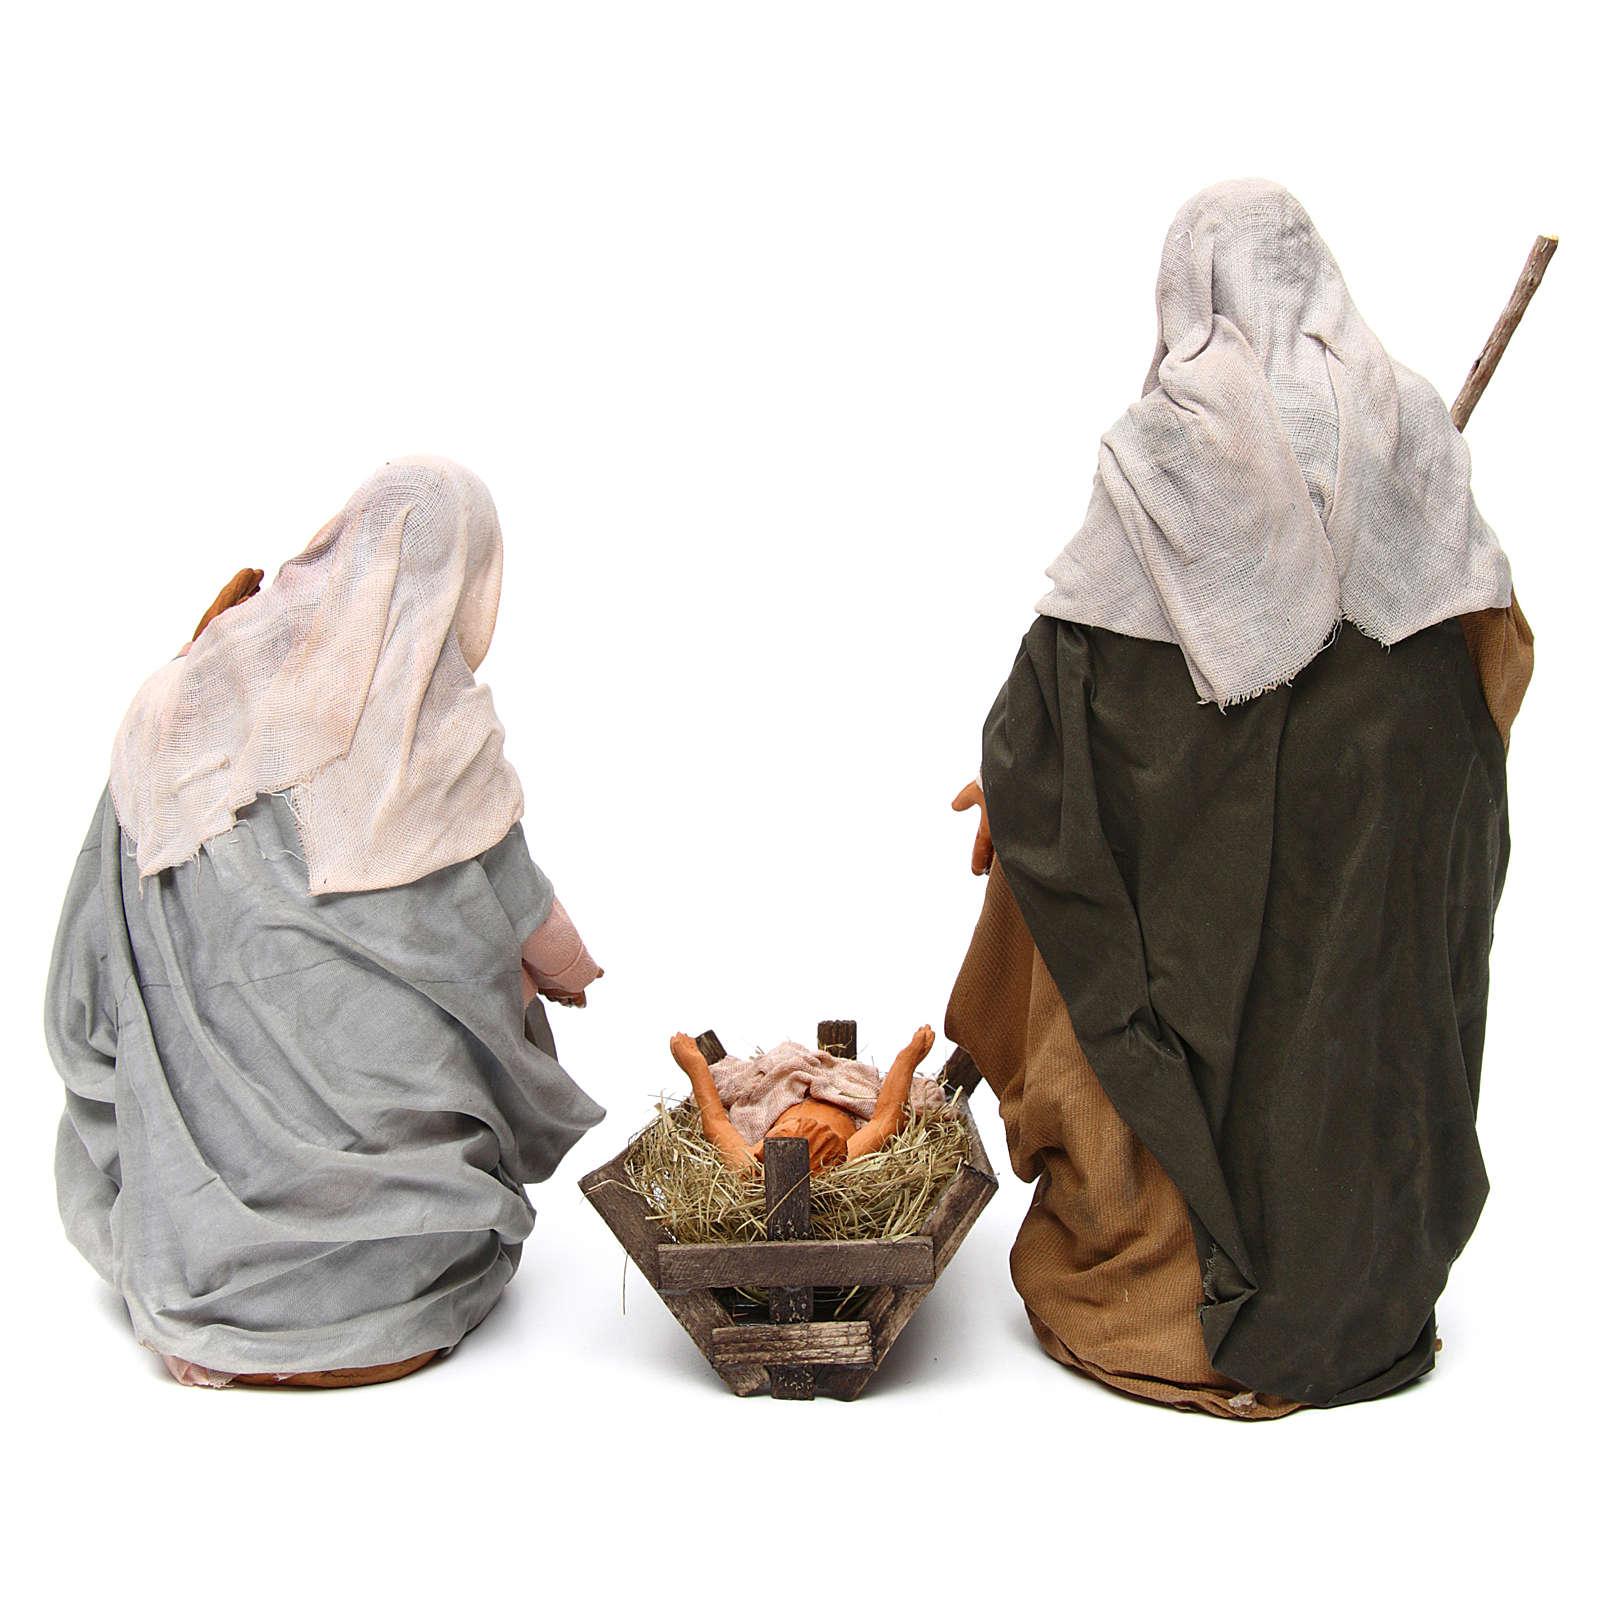 Neapolitan nativity scene Holy family 30 cm 4